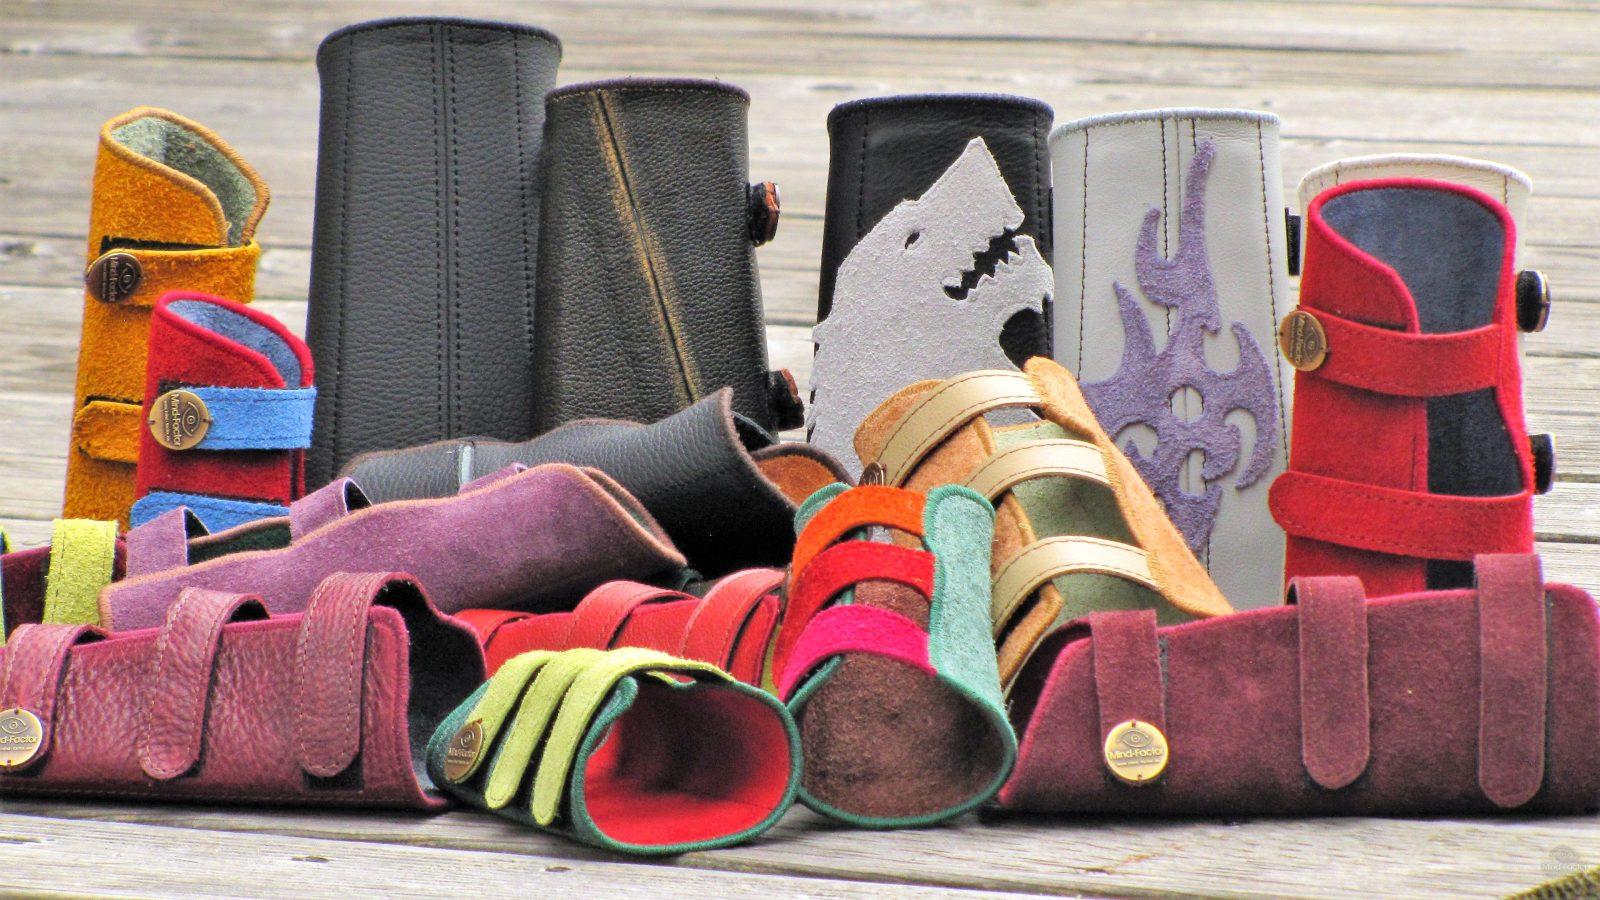 Mind-Factor Armschutz aus Leder Sortiment 2019_8